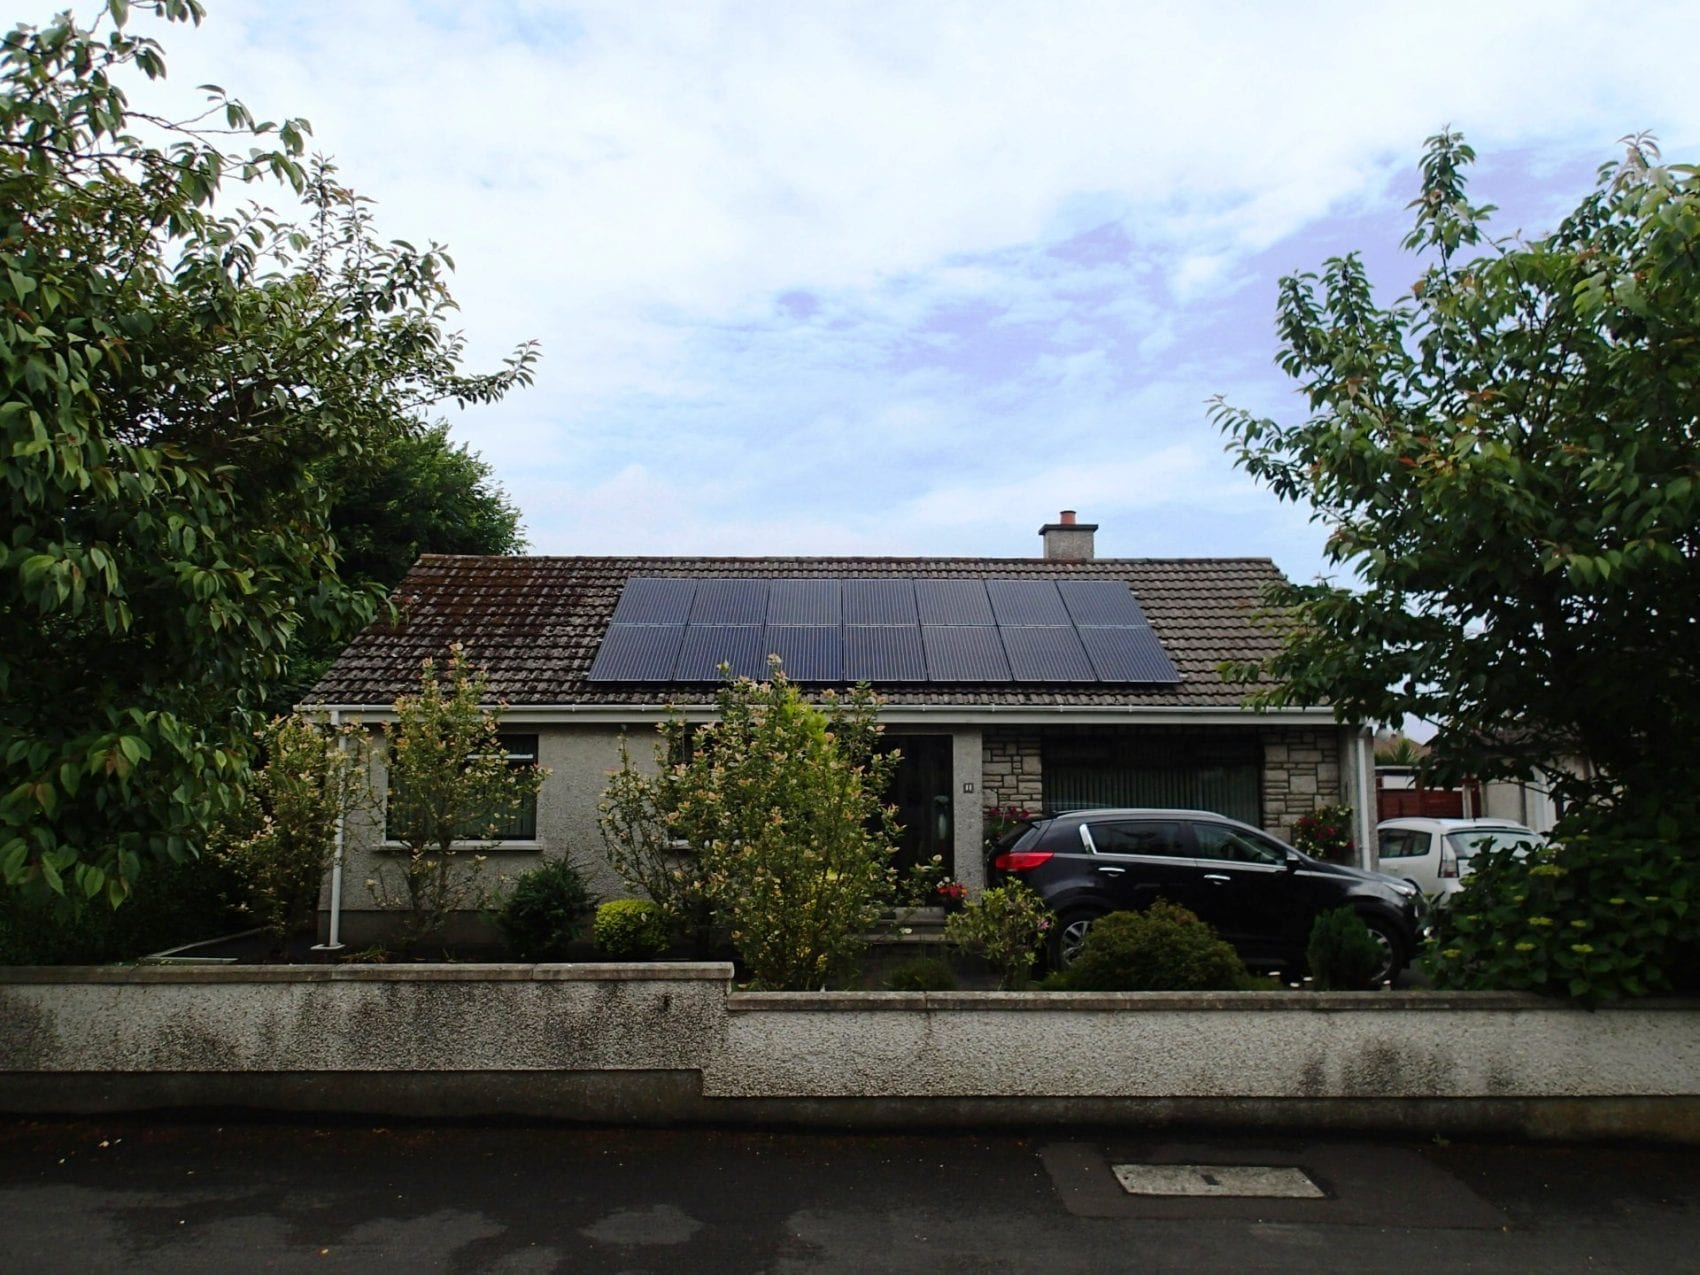 4kWp solar array installed in Coleraine